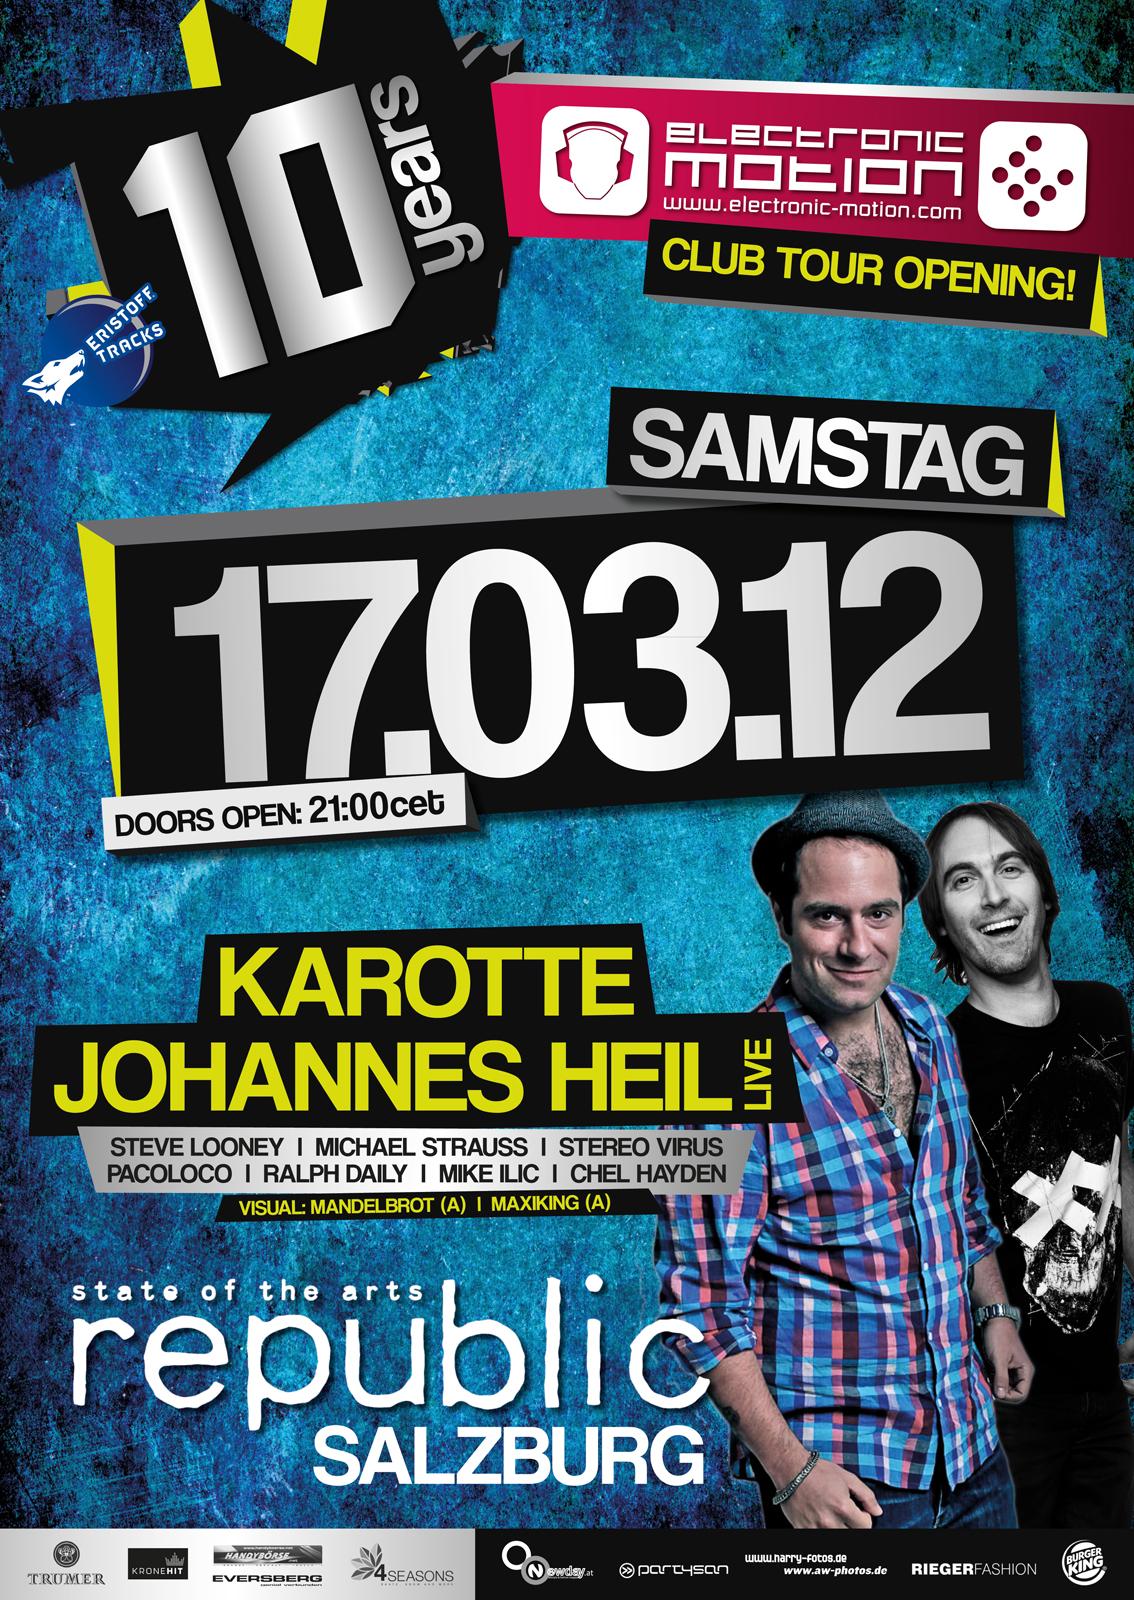 10 Jahre ELECTRONIC MOTION Österreich Club Tour, First Stop 17.03.2012 @ Republic Salzburg